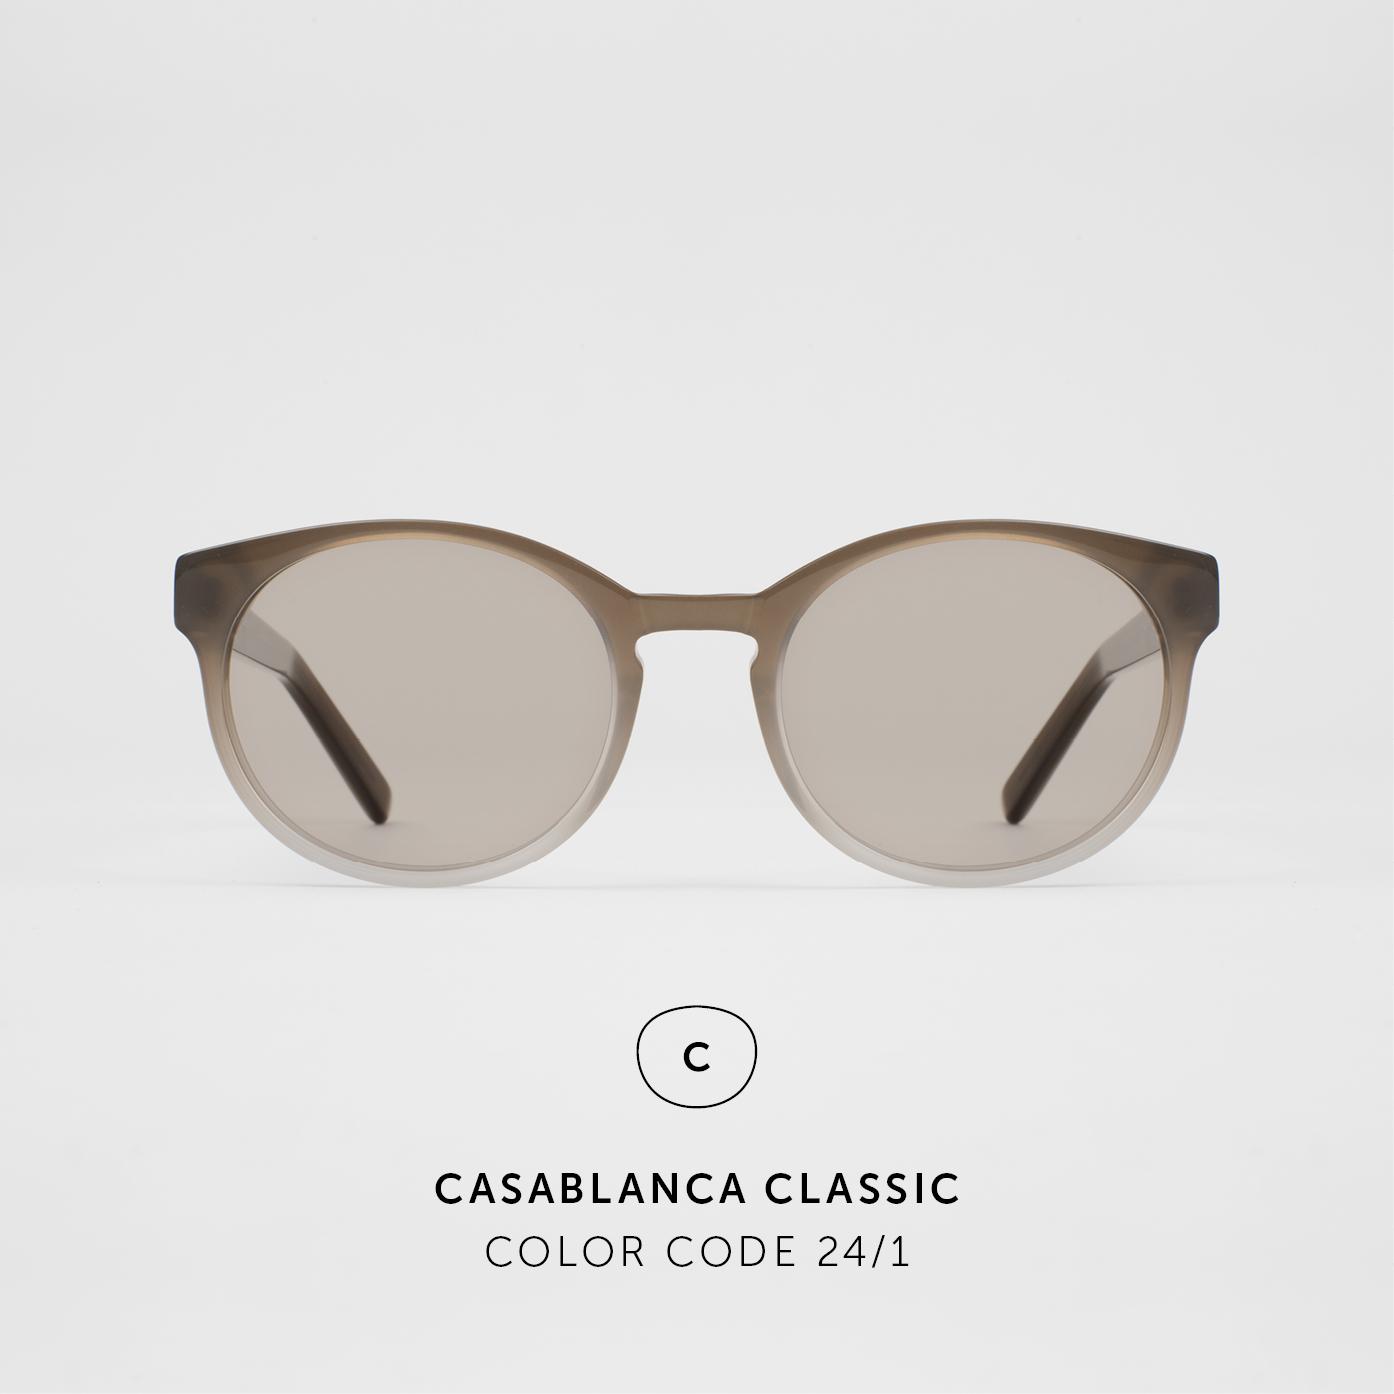 CasablancaClassic60.jpg